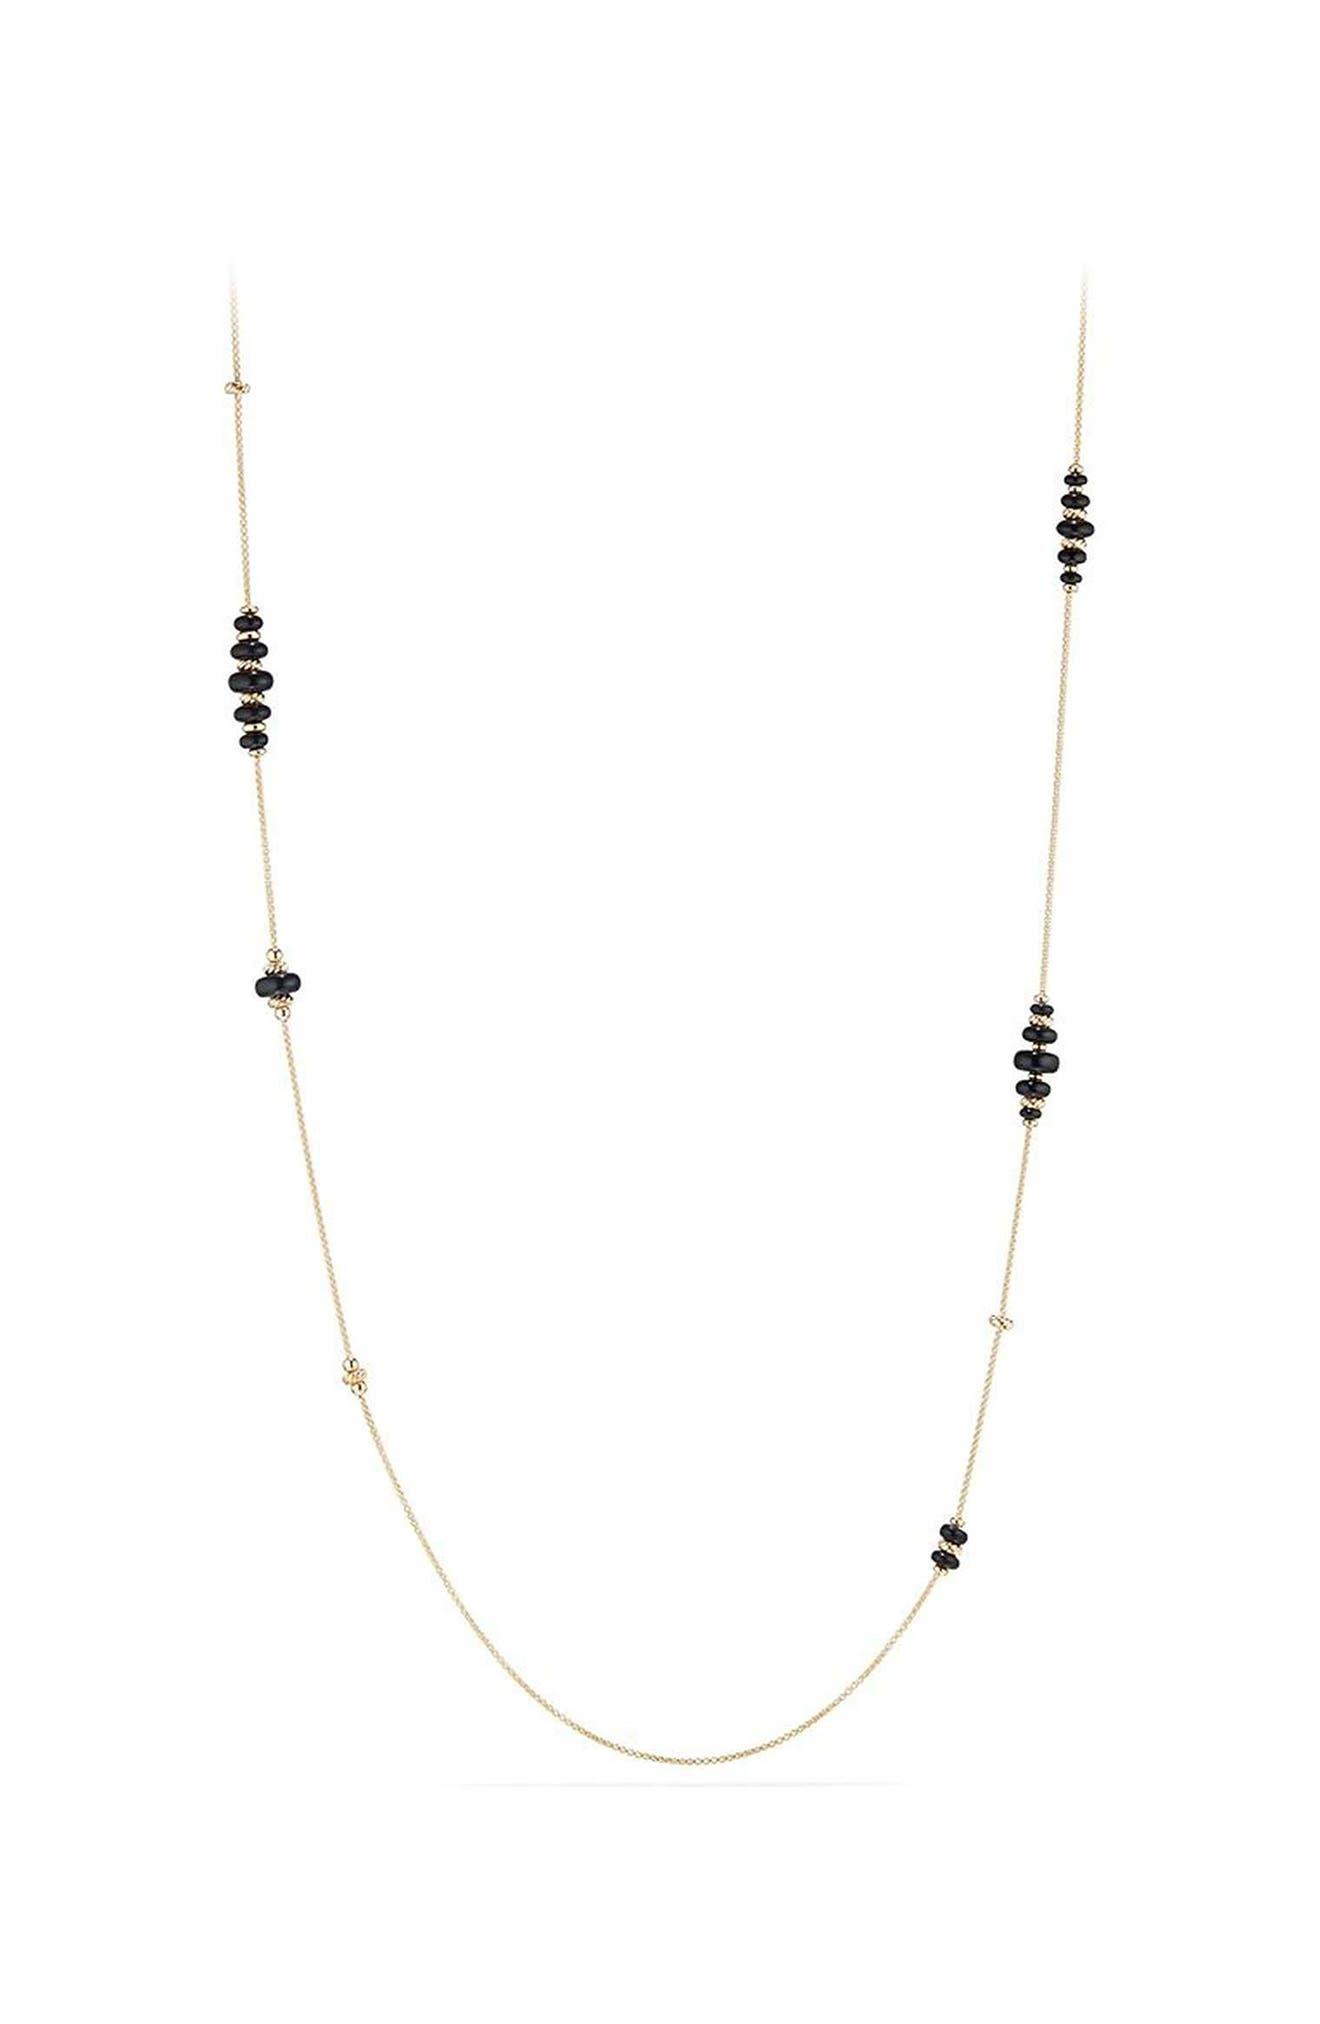 David Yurman Rio Rondelle Long 18K Gold Station Necklace